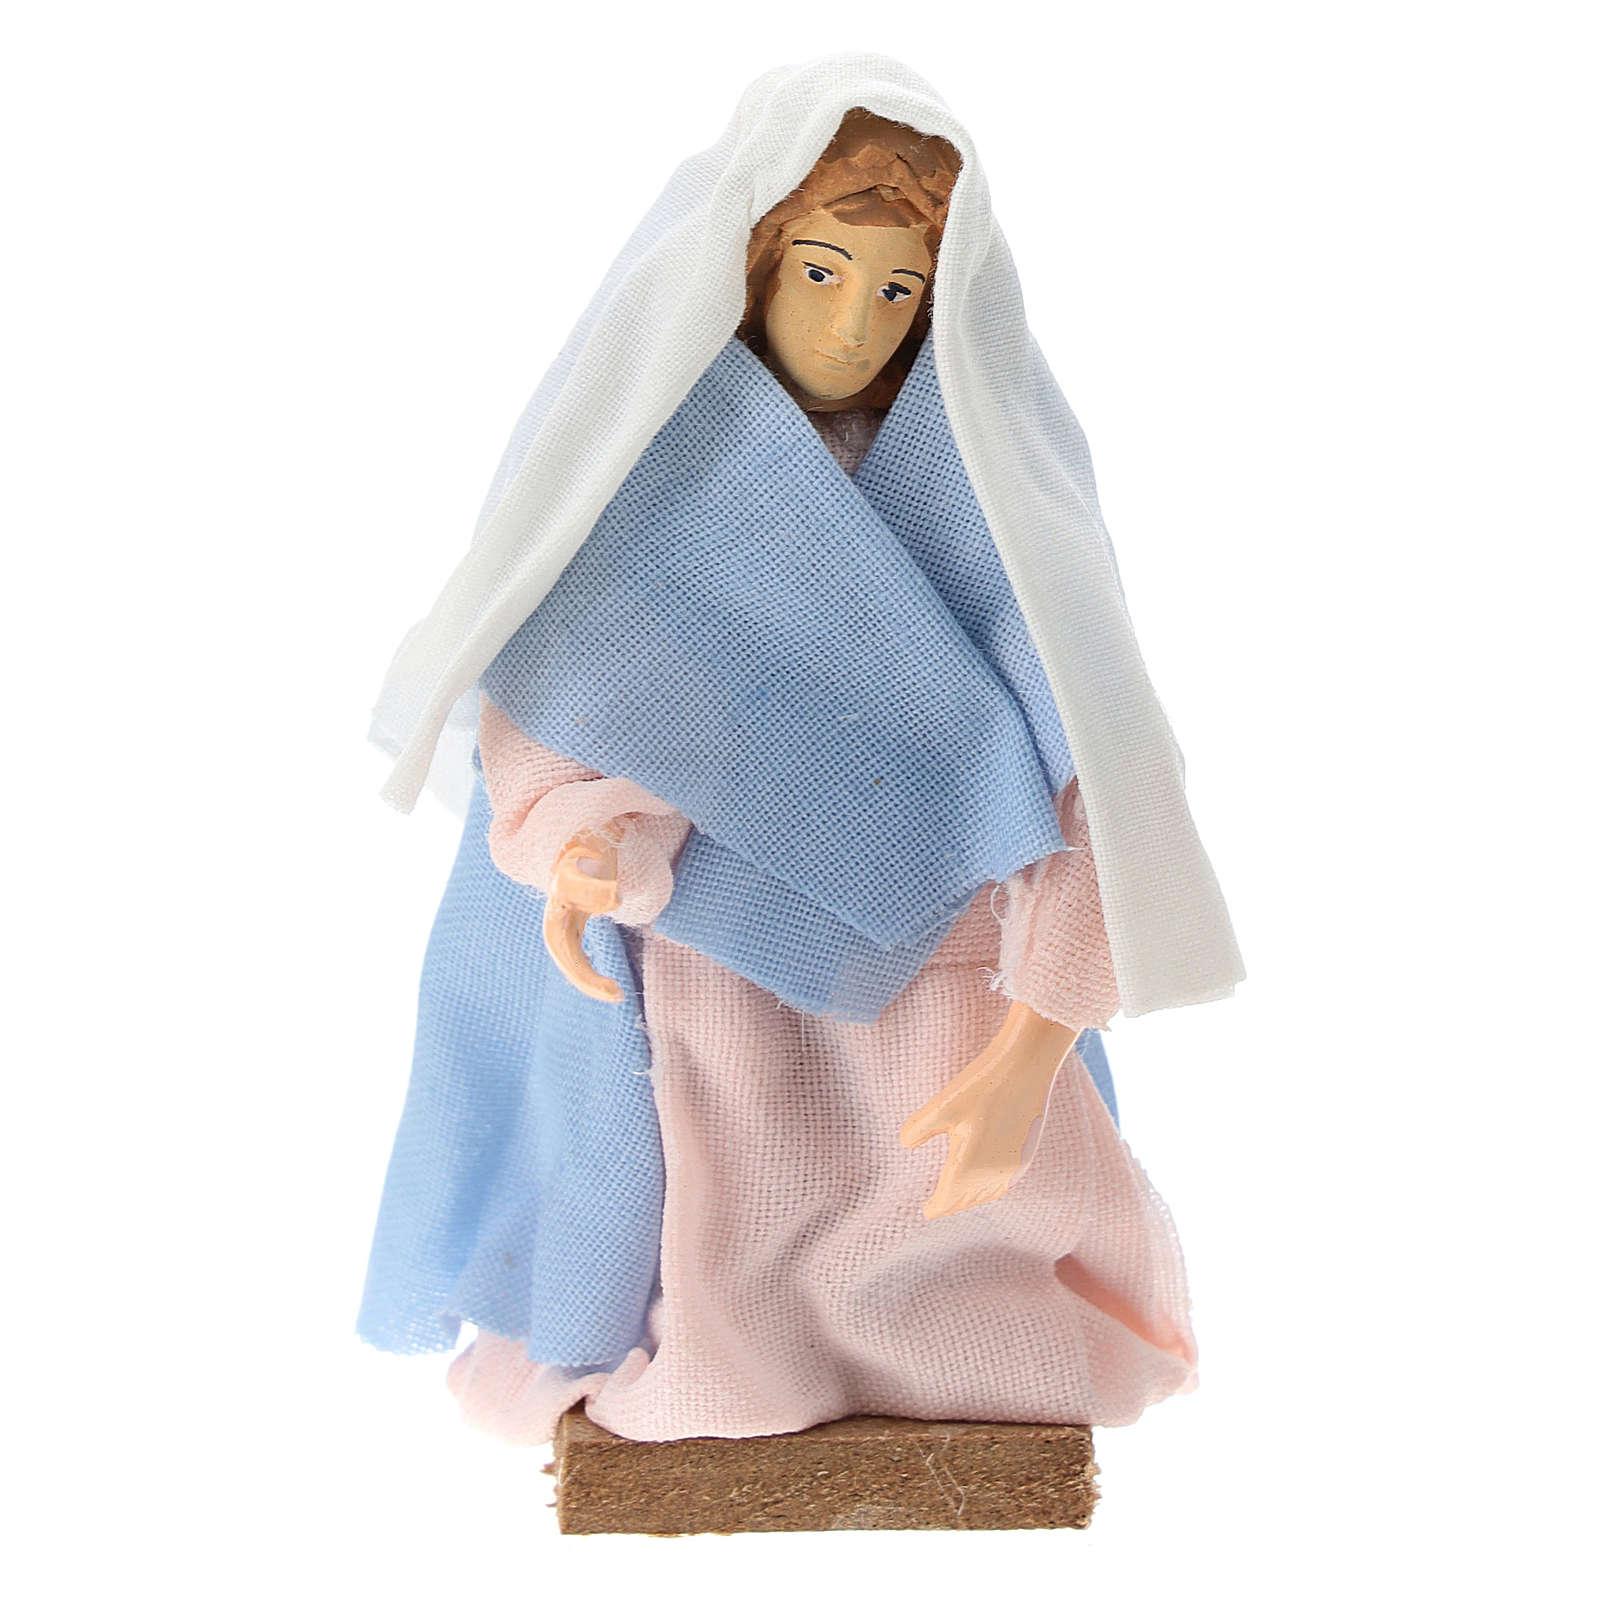 Virgen terracota y plástico belén de 12 cm 3